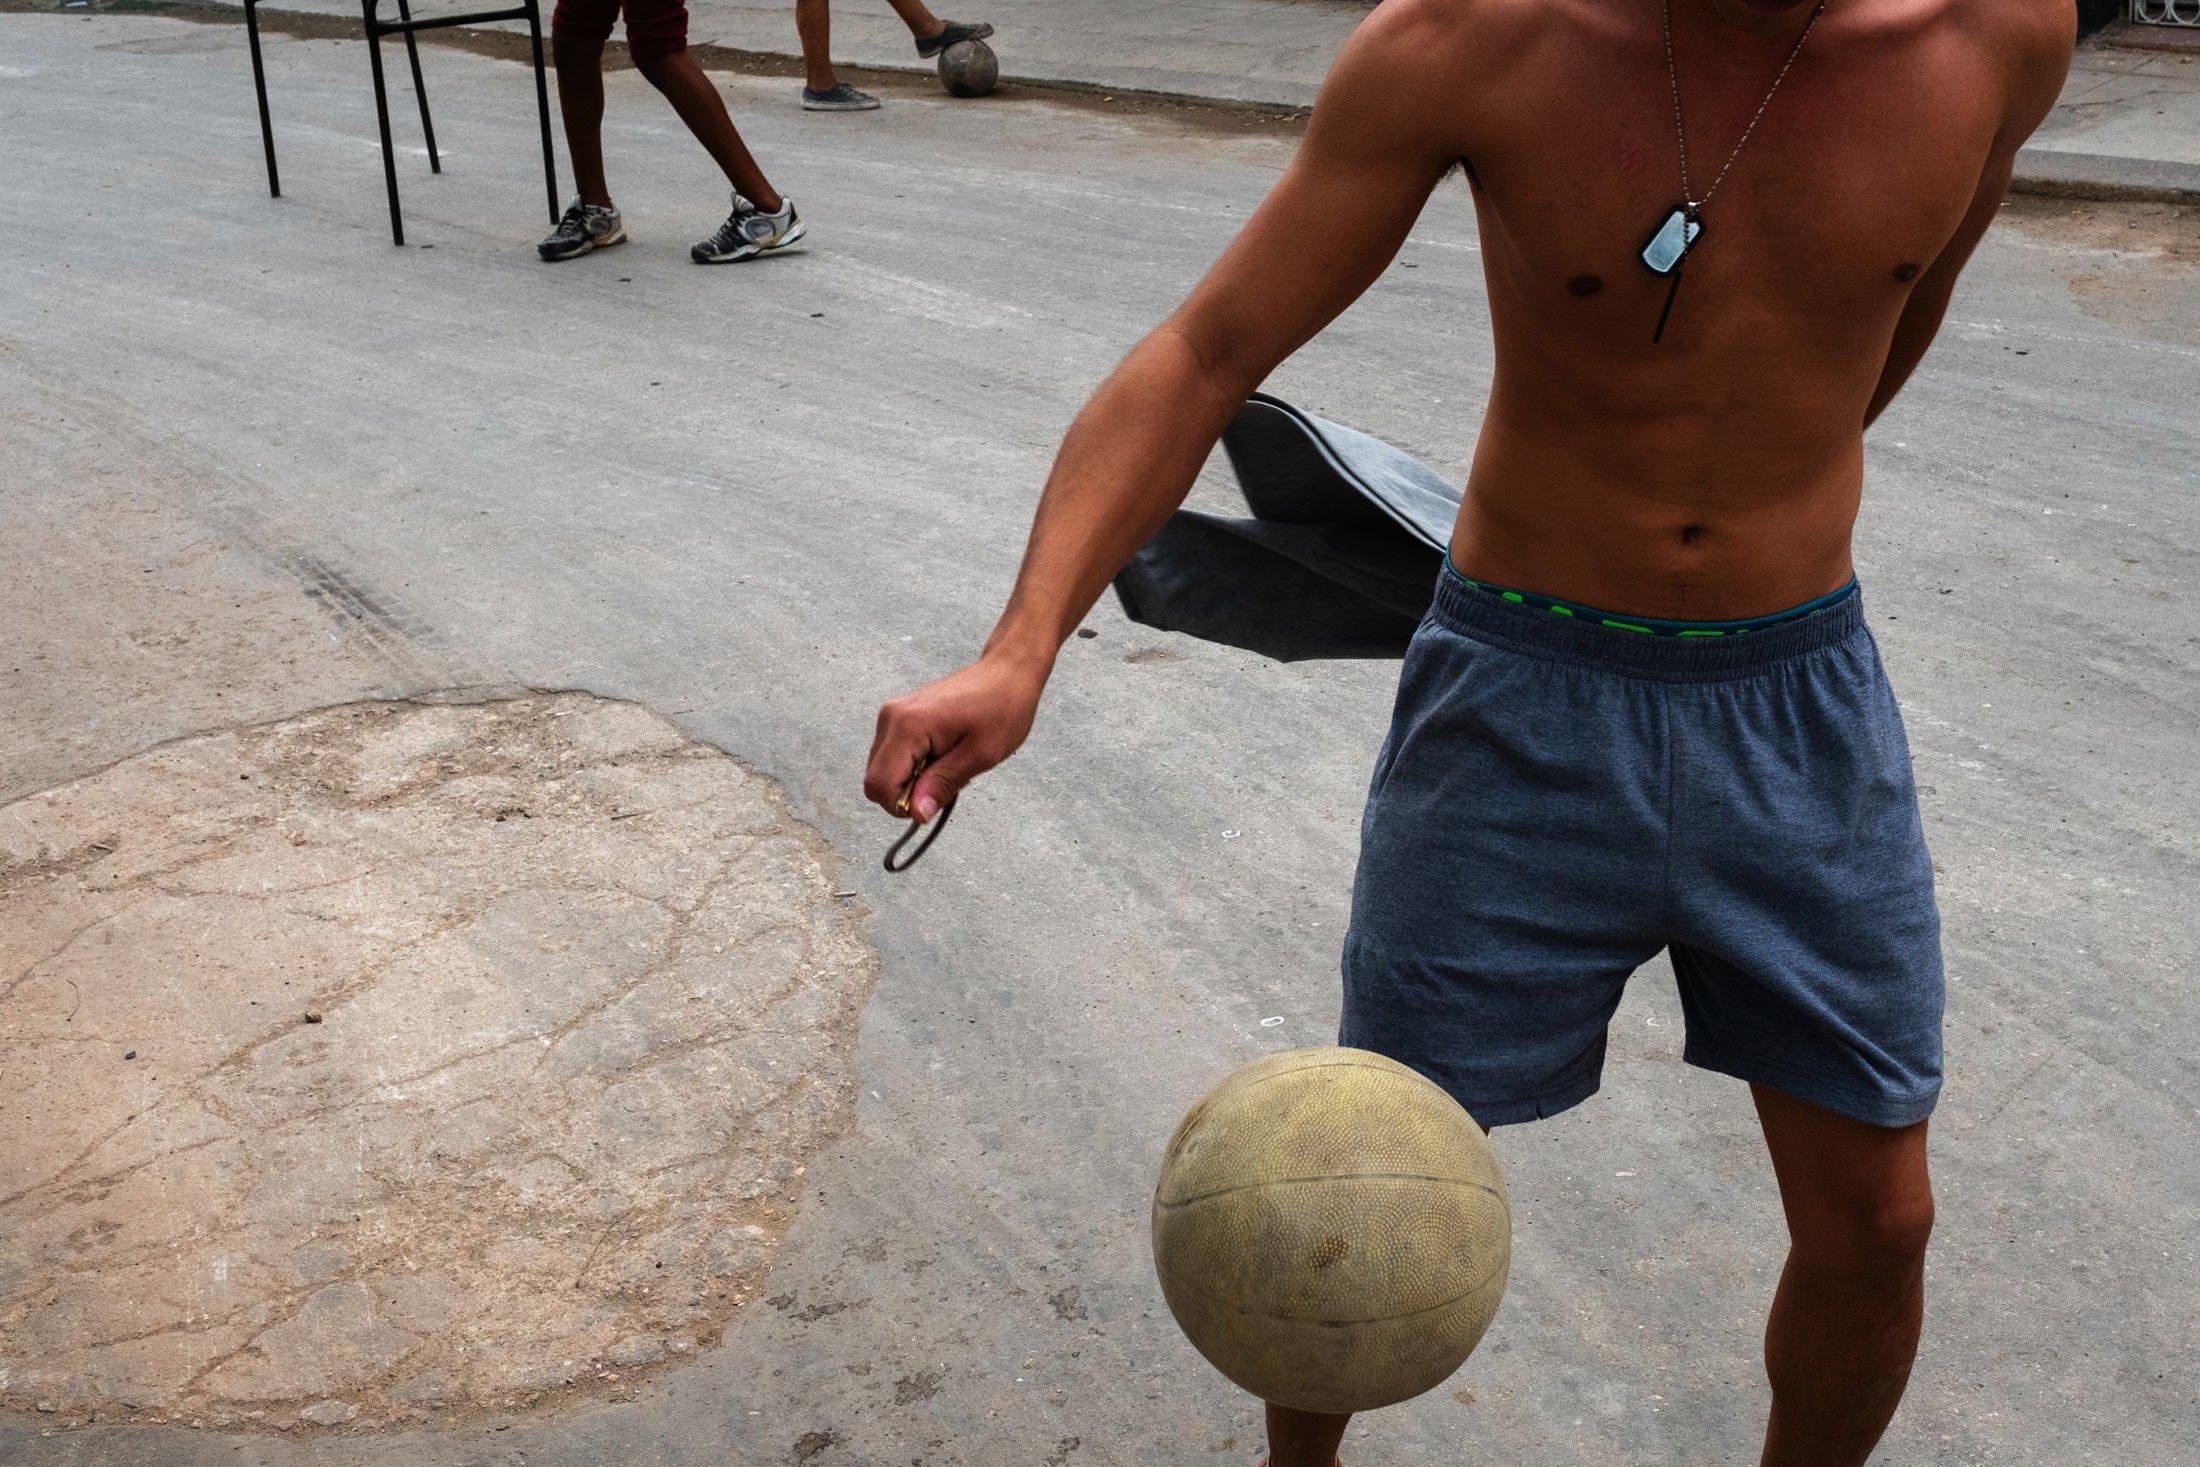 a boy kicking a football in Cuba